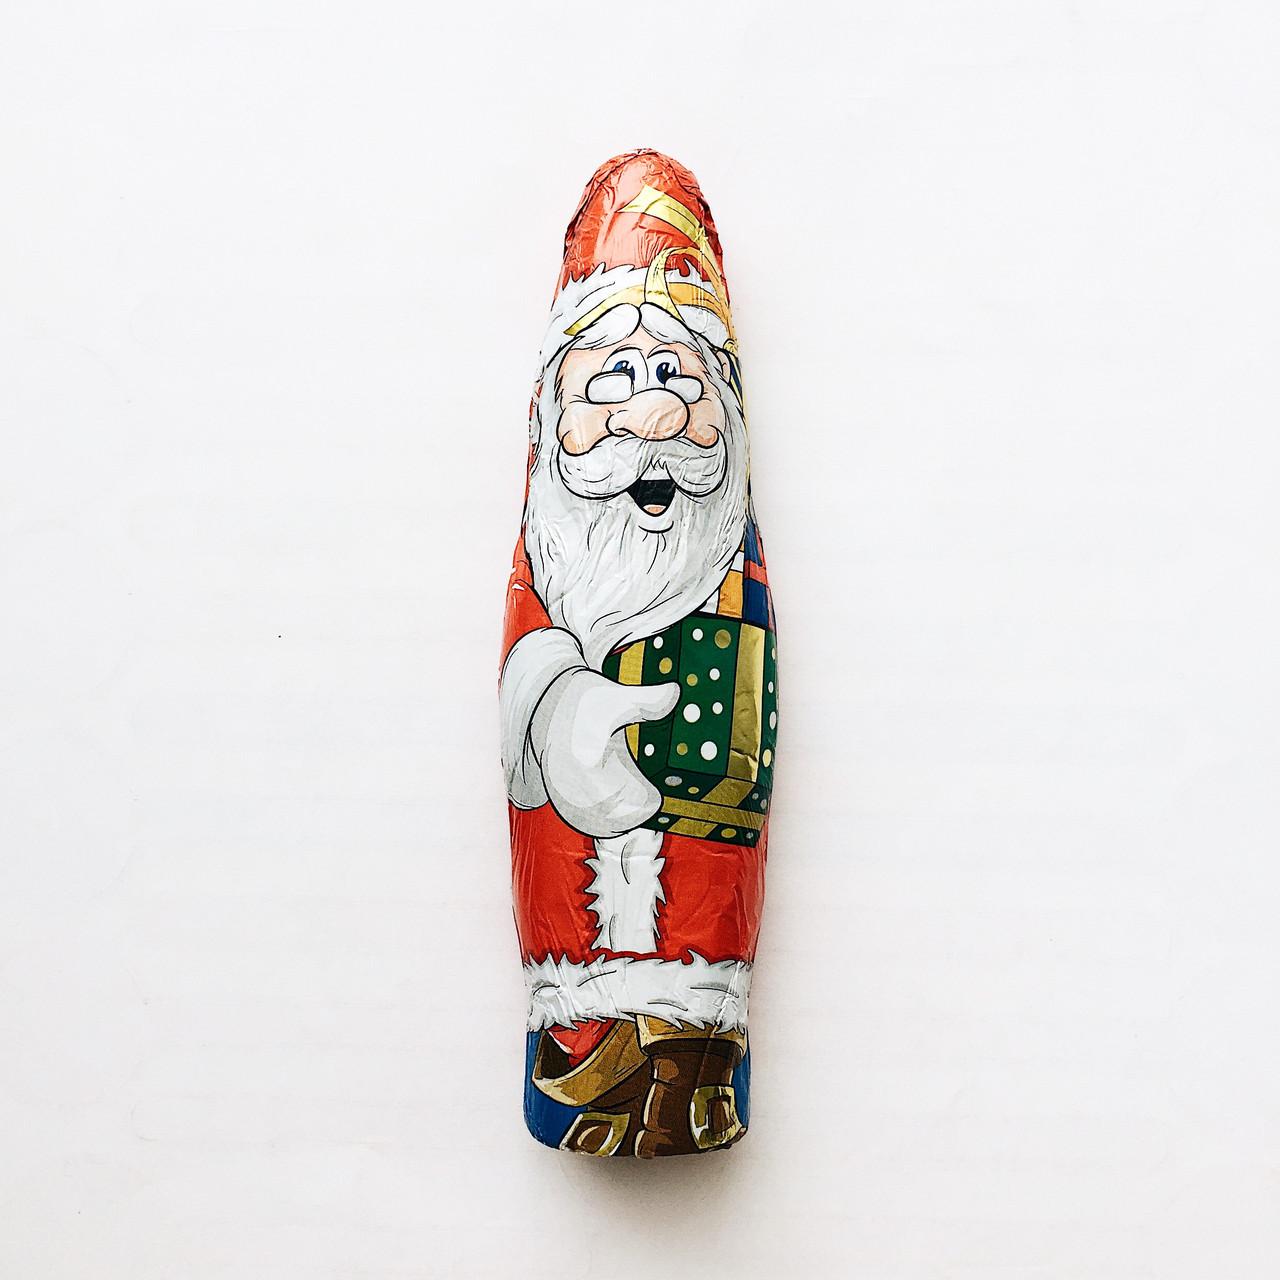 Шоколадный Дед Мороз 60 гр. (Германия)